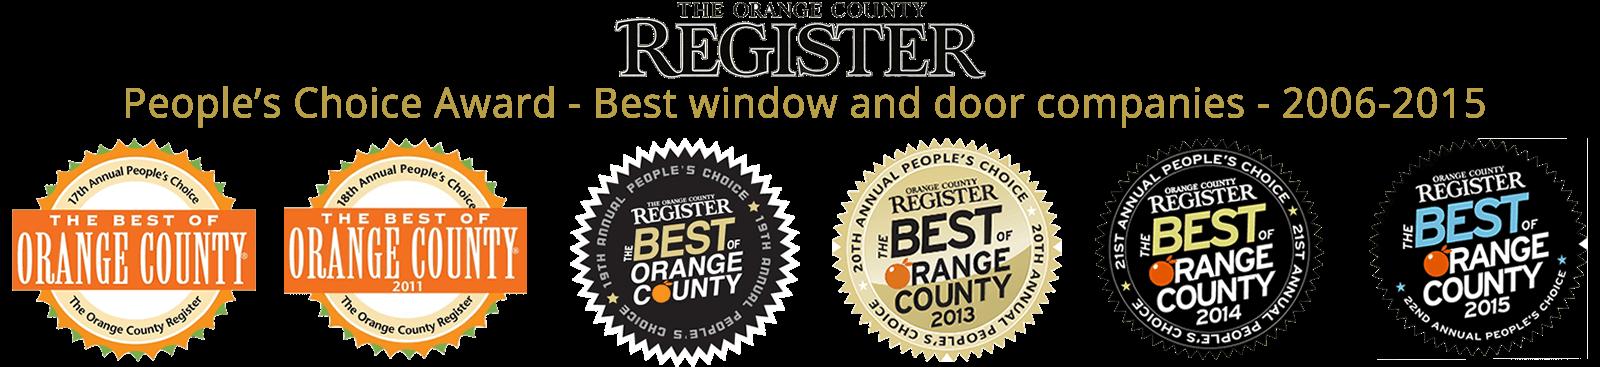 OC Register's People Choice Award Winner for Windows & Doors